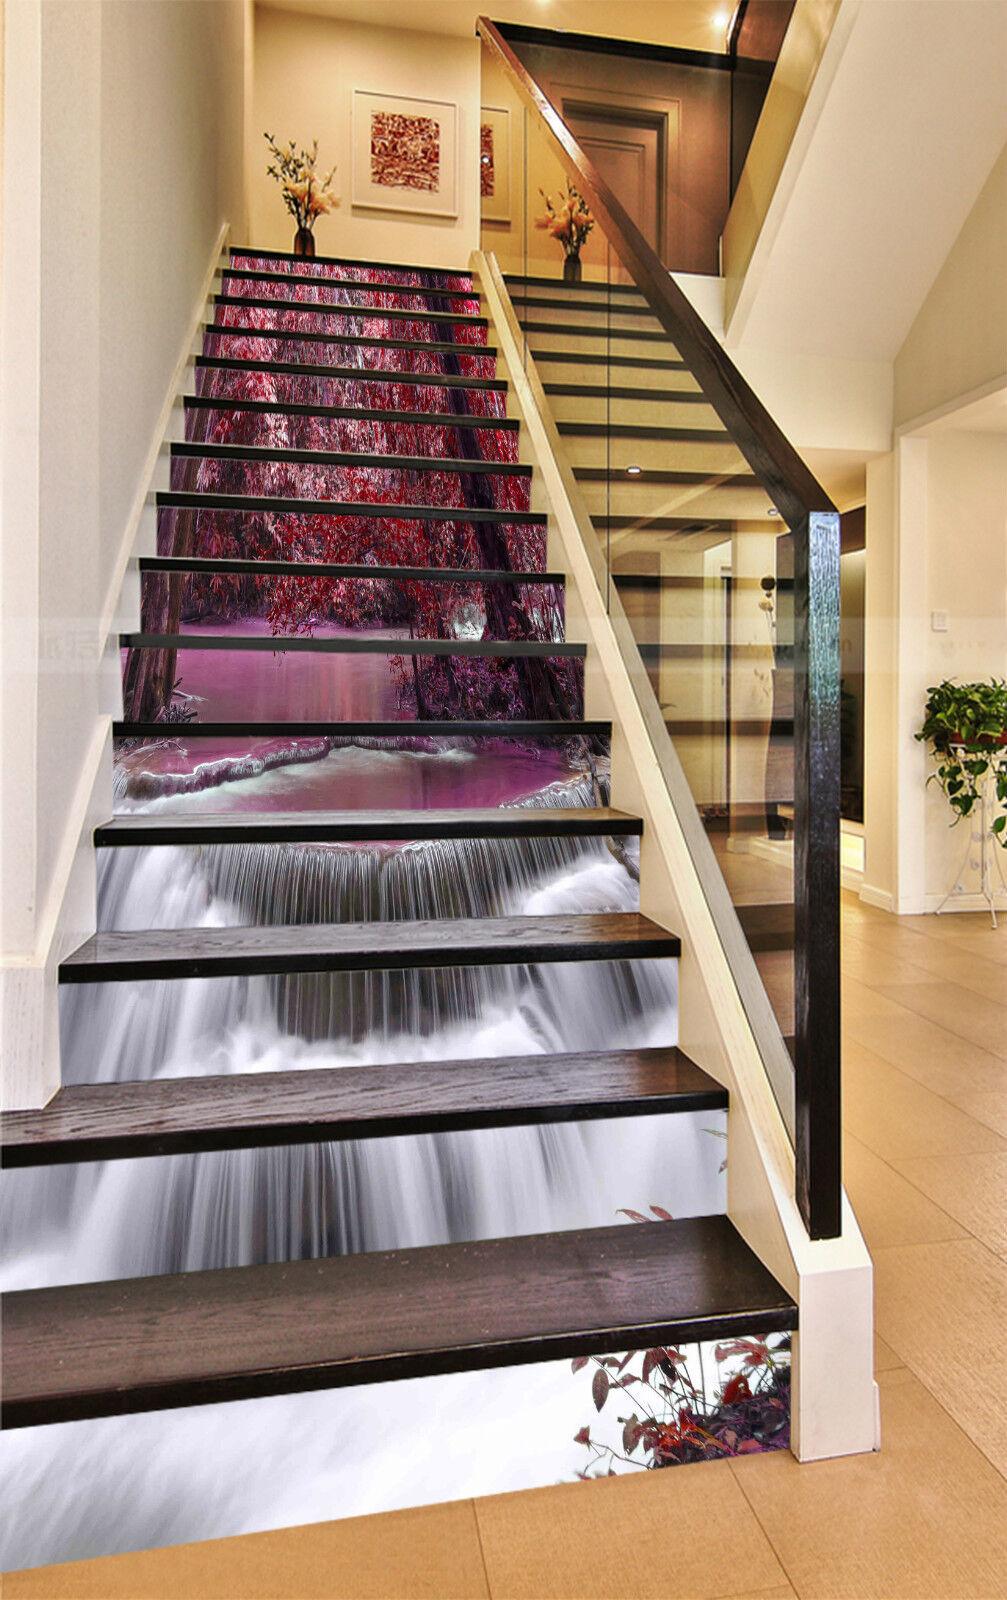 3D Rote Wald 531 Stair Risers Dekoration Fototapete Vinyl Aufkleber Tapete DE